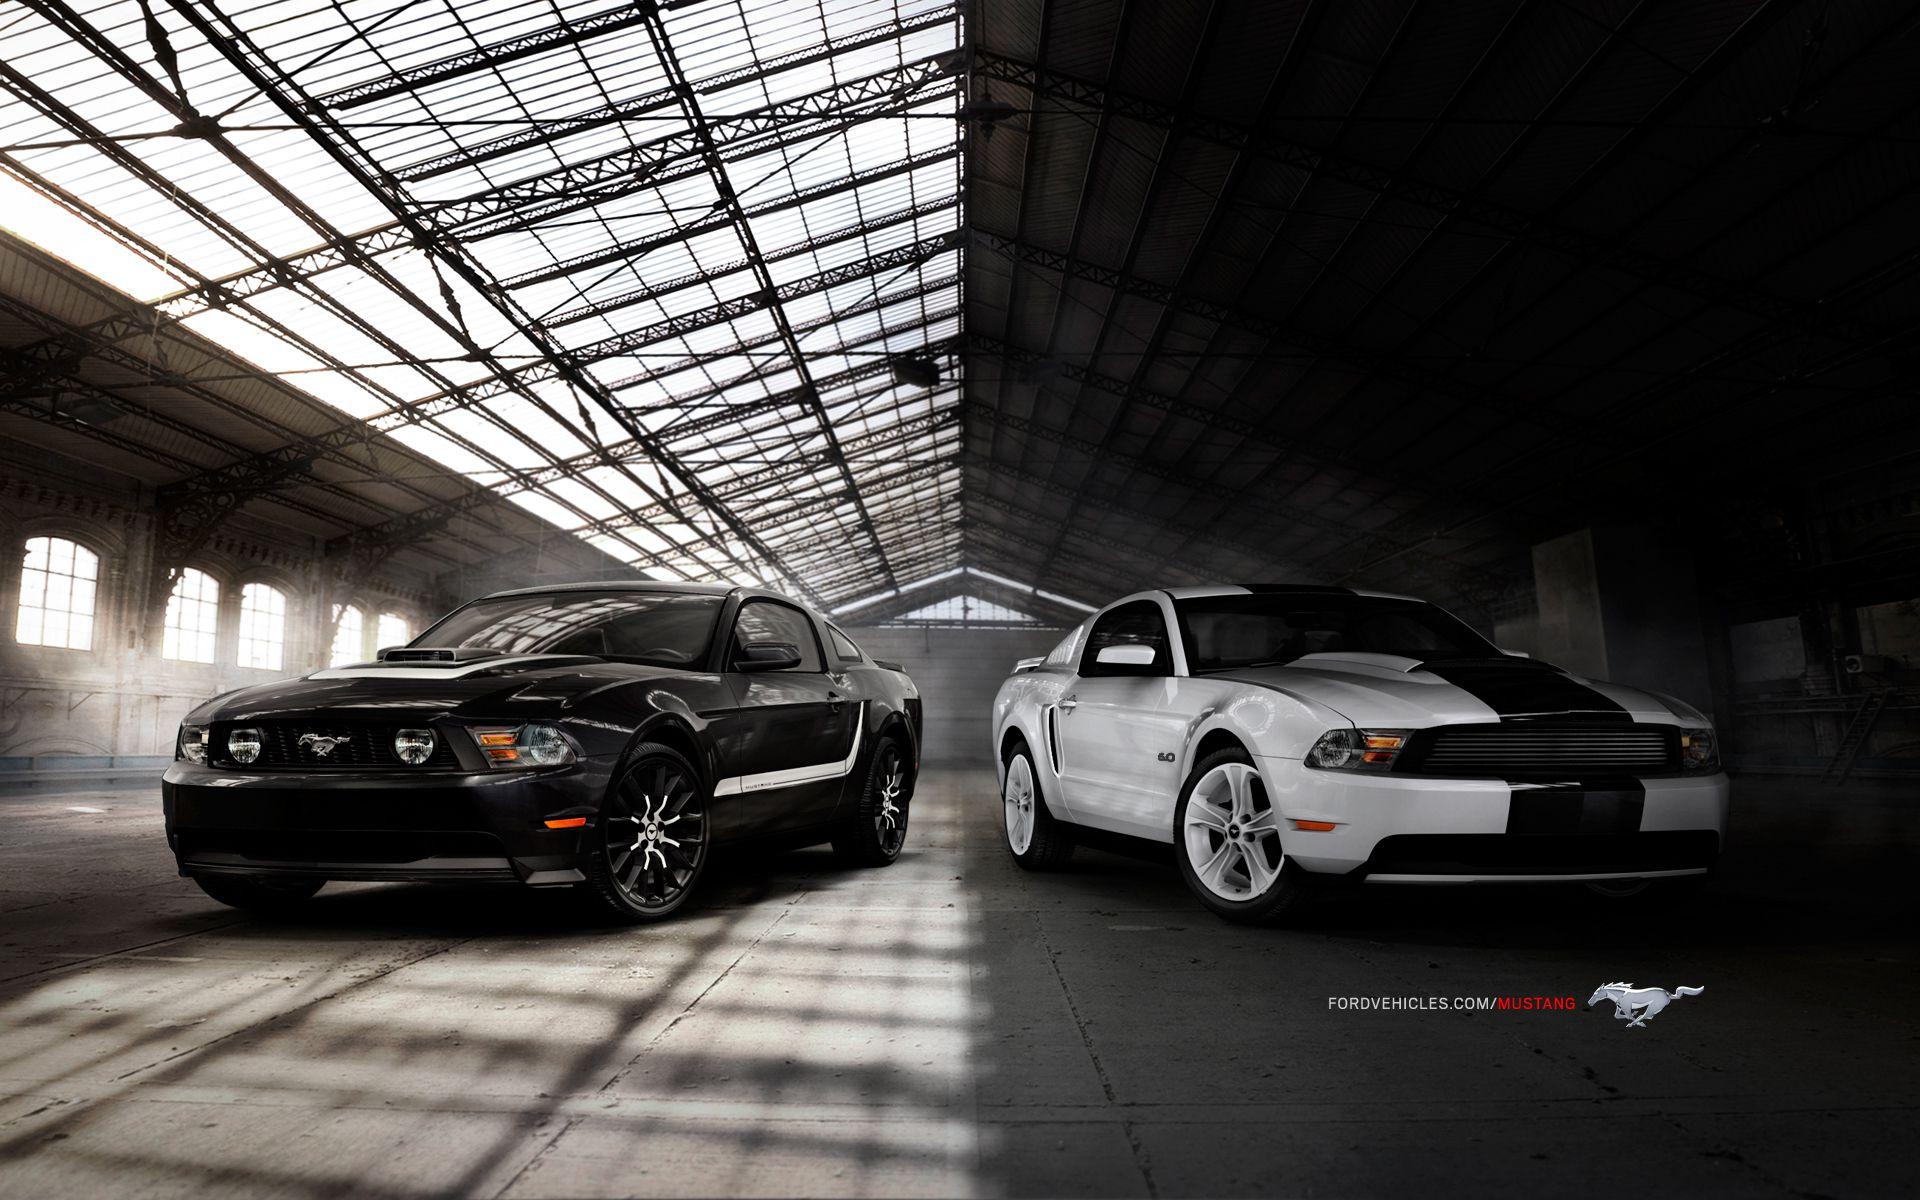 Ford Mustang GT White Black Car Ford Wallpaper Car Wallpaper 1920x1200